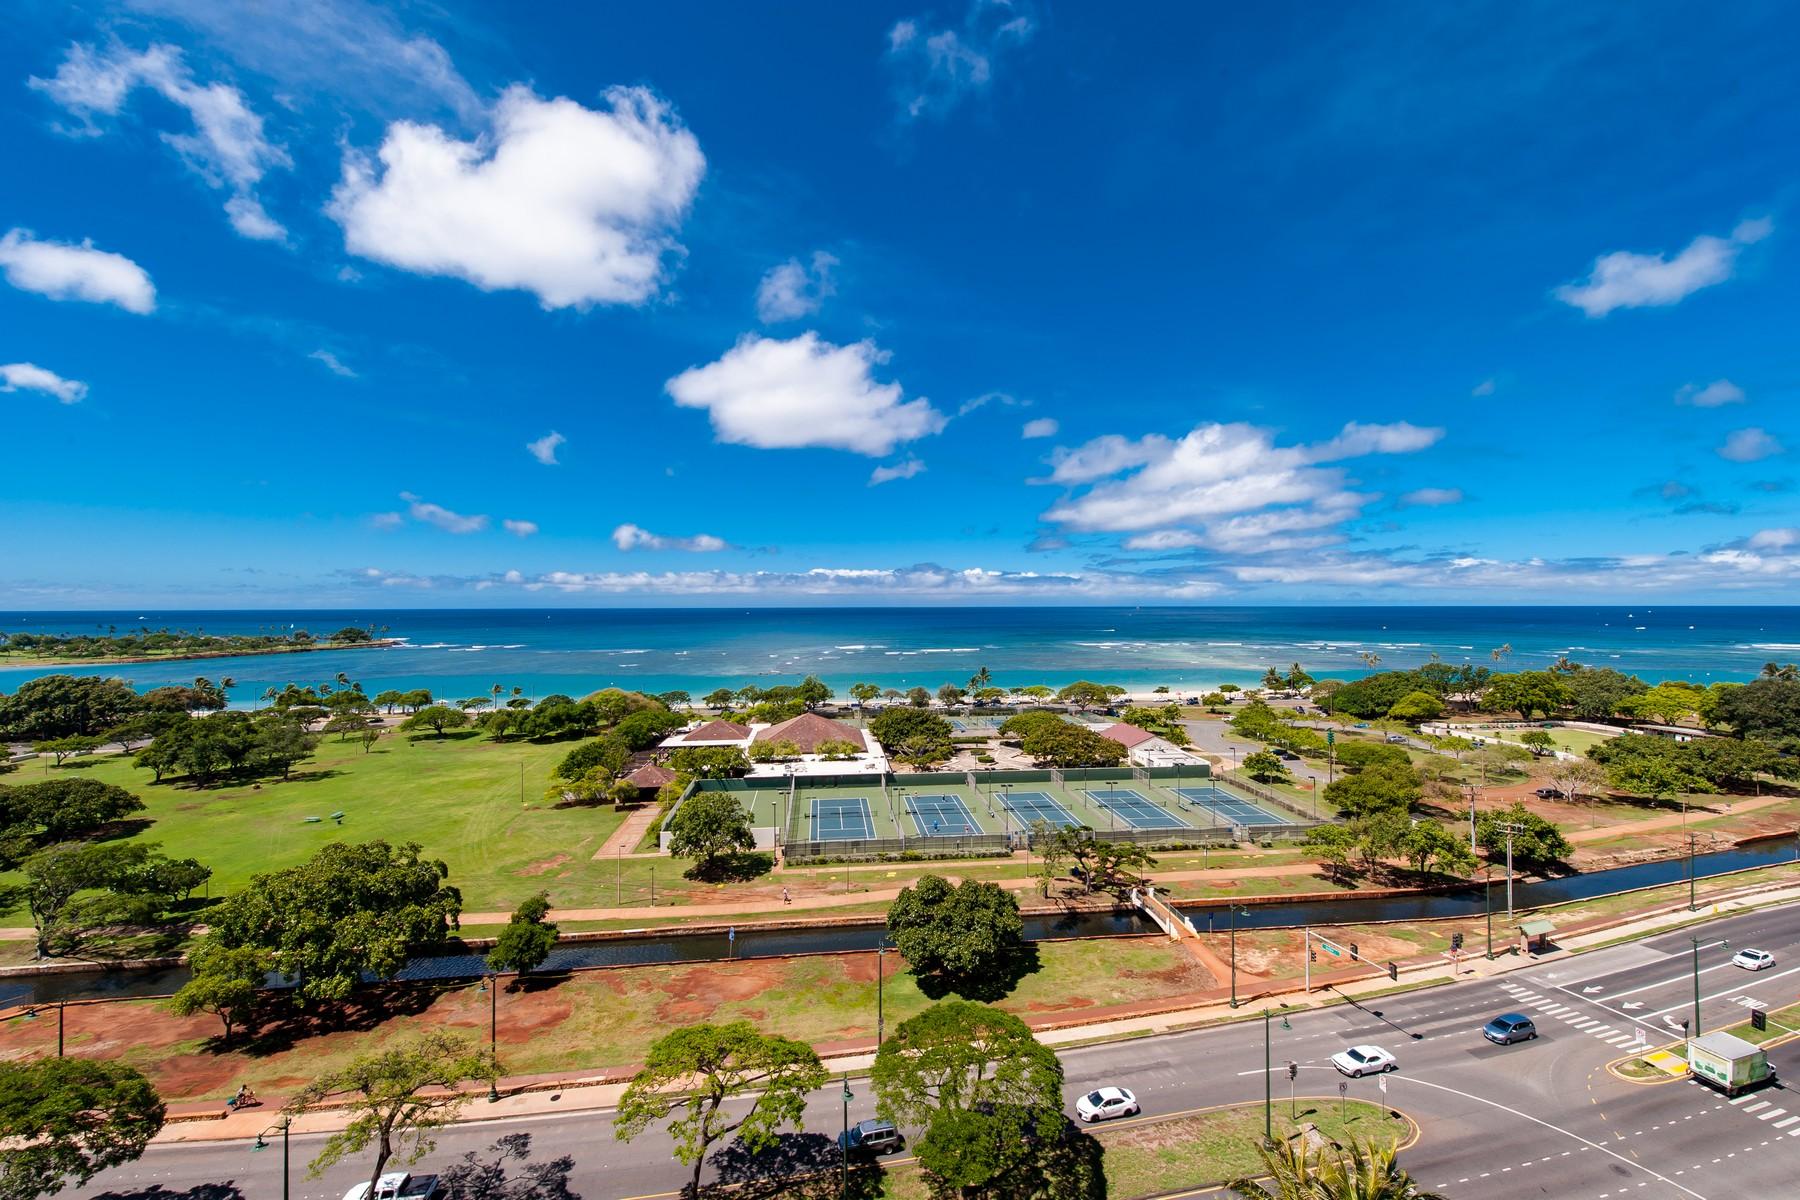 Condominium for Active at Spectacular Ocean View Condo 1288 Ala Moana Blvd #12E & 12F Honolulu, Hawaii 96814 United States